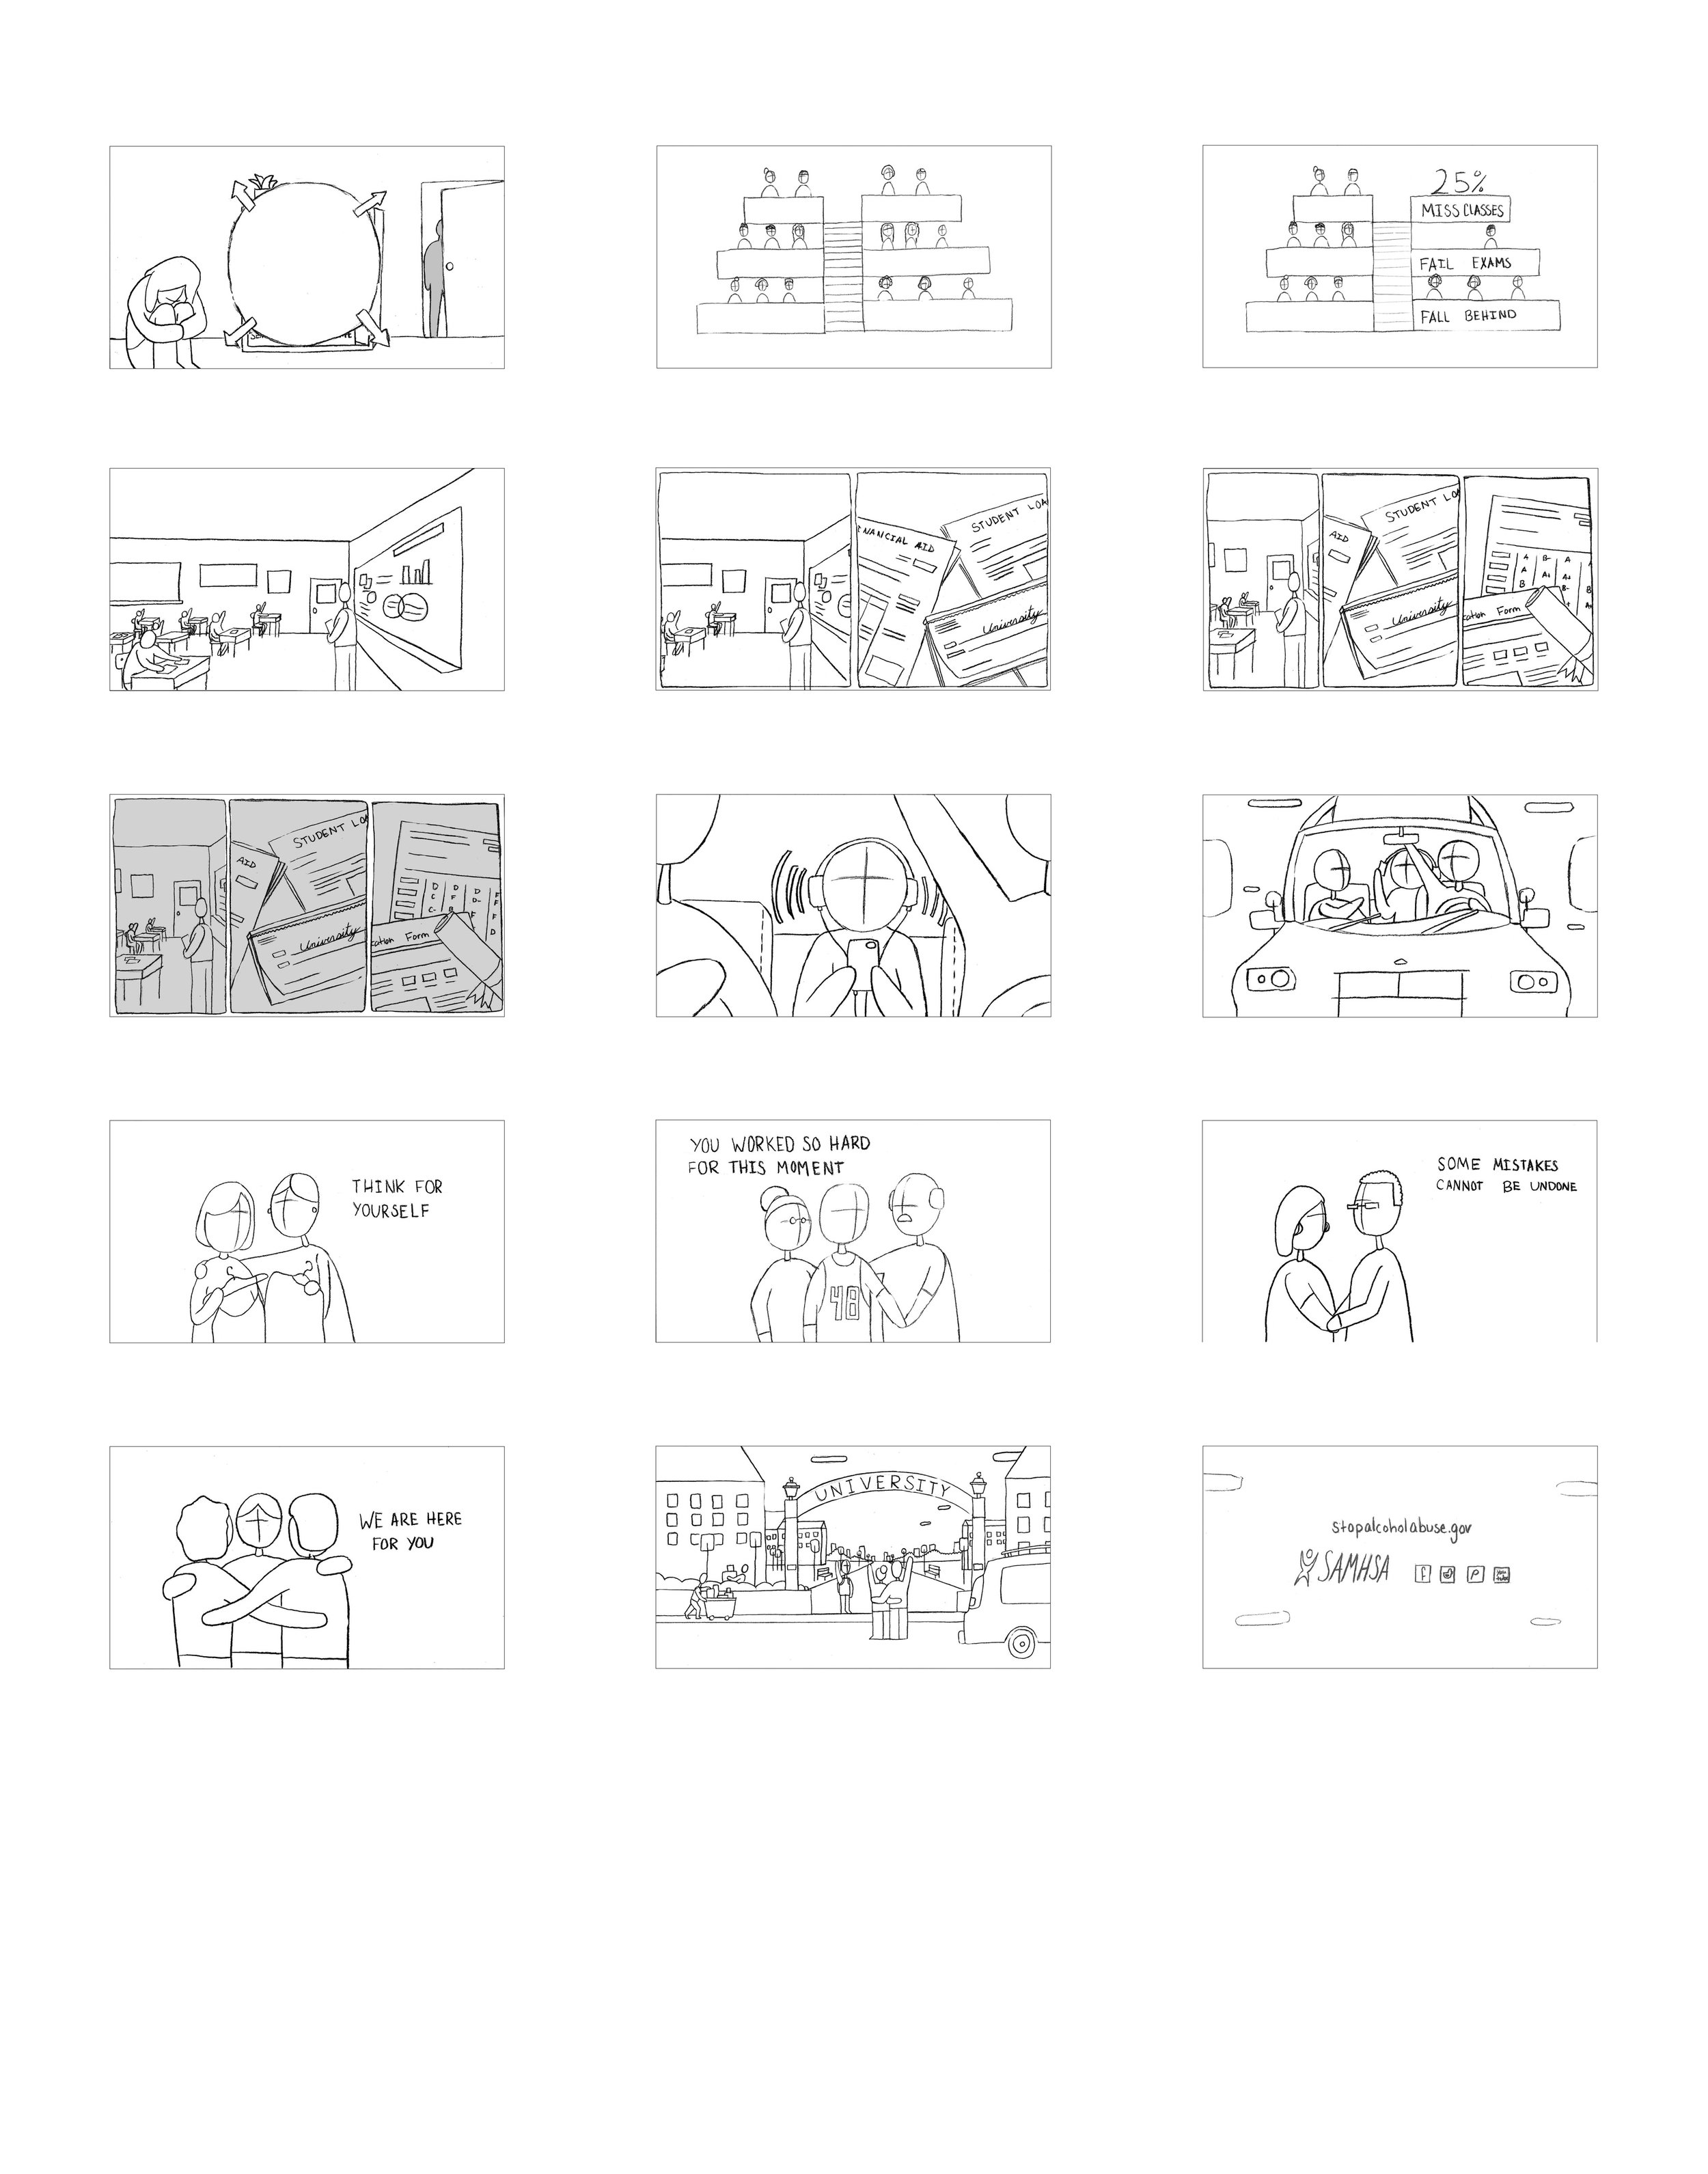 UAD_Transition_Storyboard_02_v01.jpg